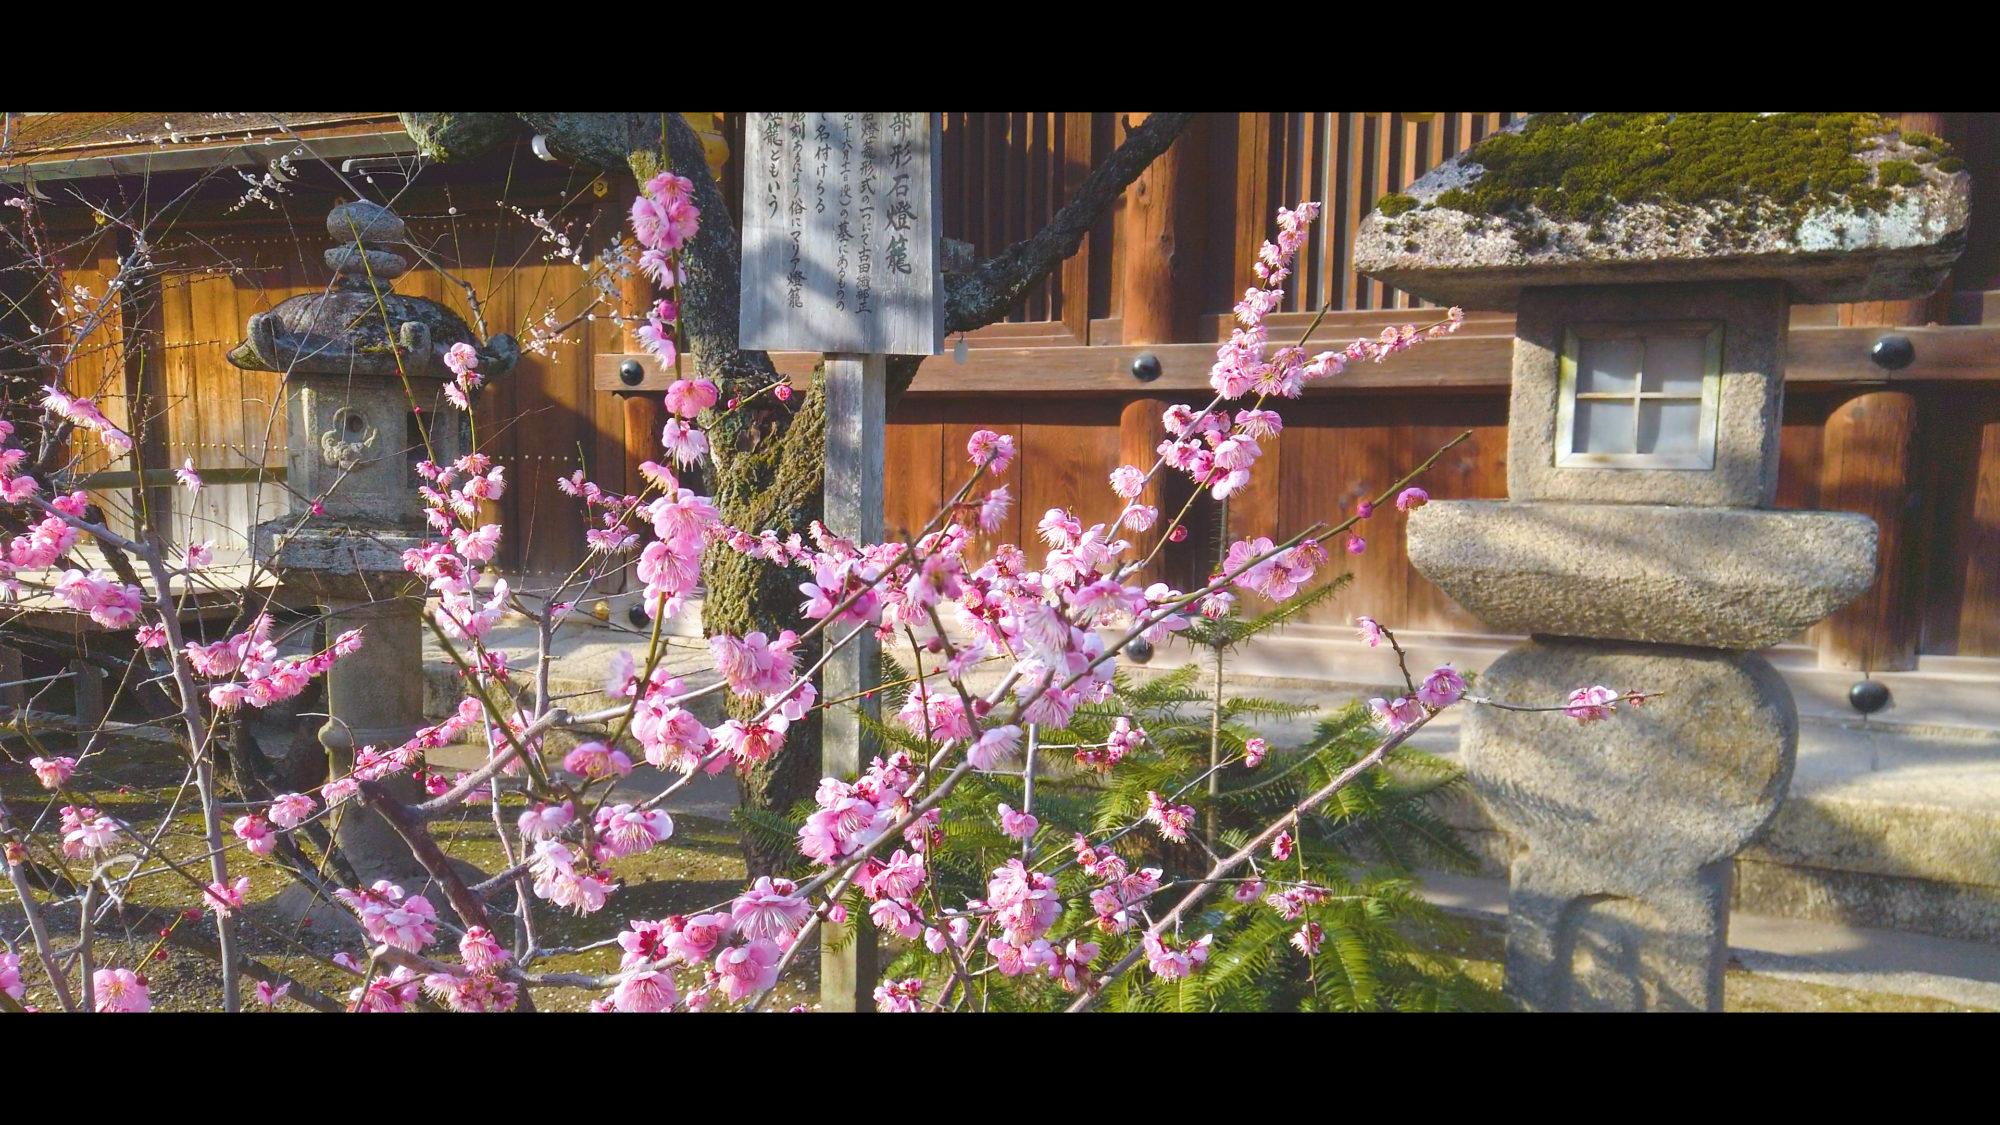 0eac970d6461c36752be6cda681bb823-e1582382850250 京都府 北野天満宮 Kitano Tenmangu (2020年 京都の春におすすめ梅苑・梅林スポット! 撮影した写真の紹介、ライトアップ・アクセス情報や交通手段・駐車場情報などまとめ)